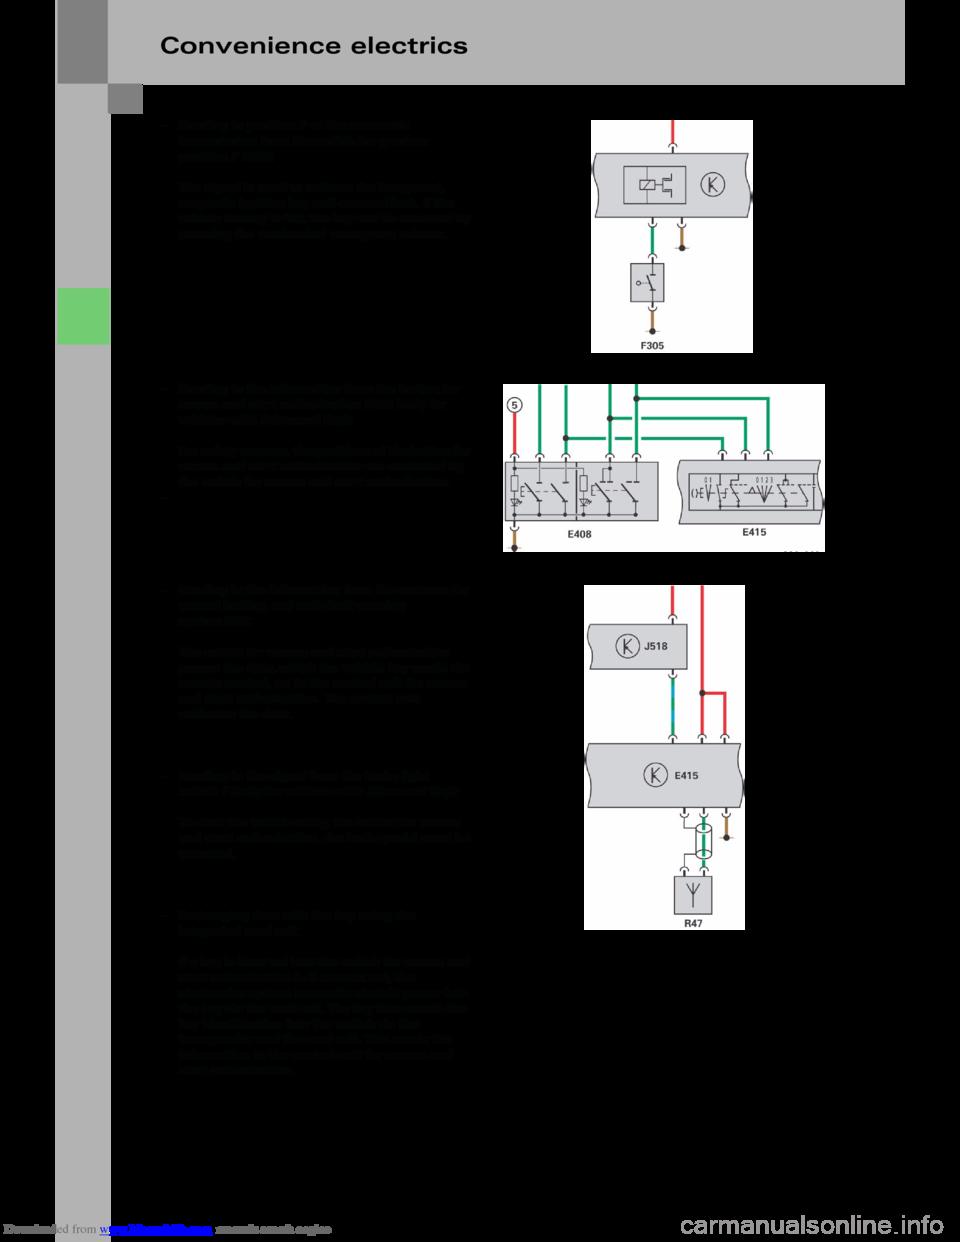 06 mitsubishi durocross wiring diagrams mitsubishi es